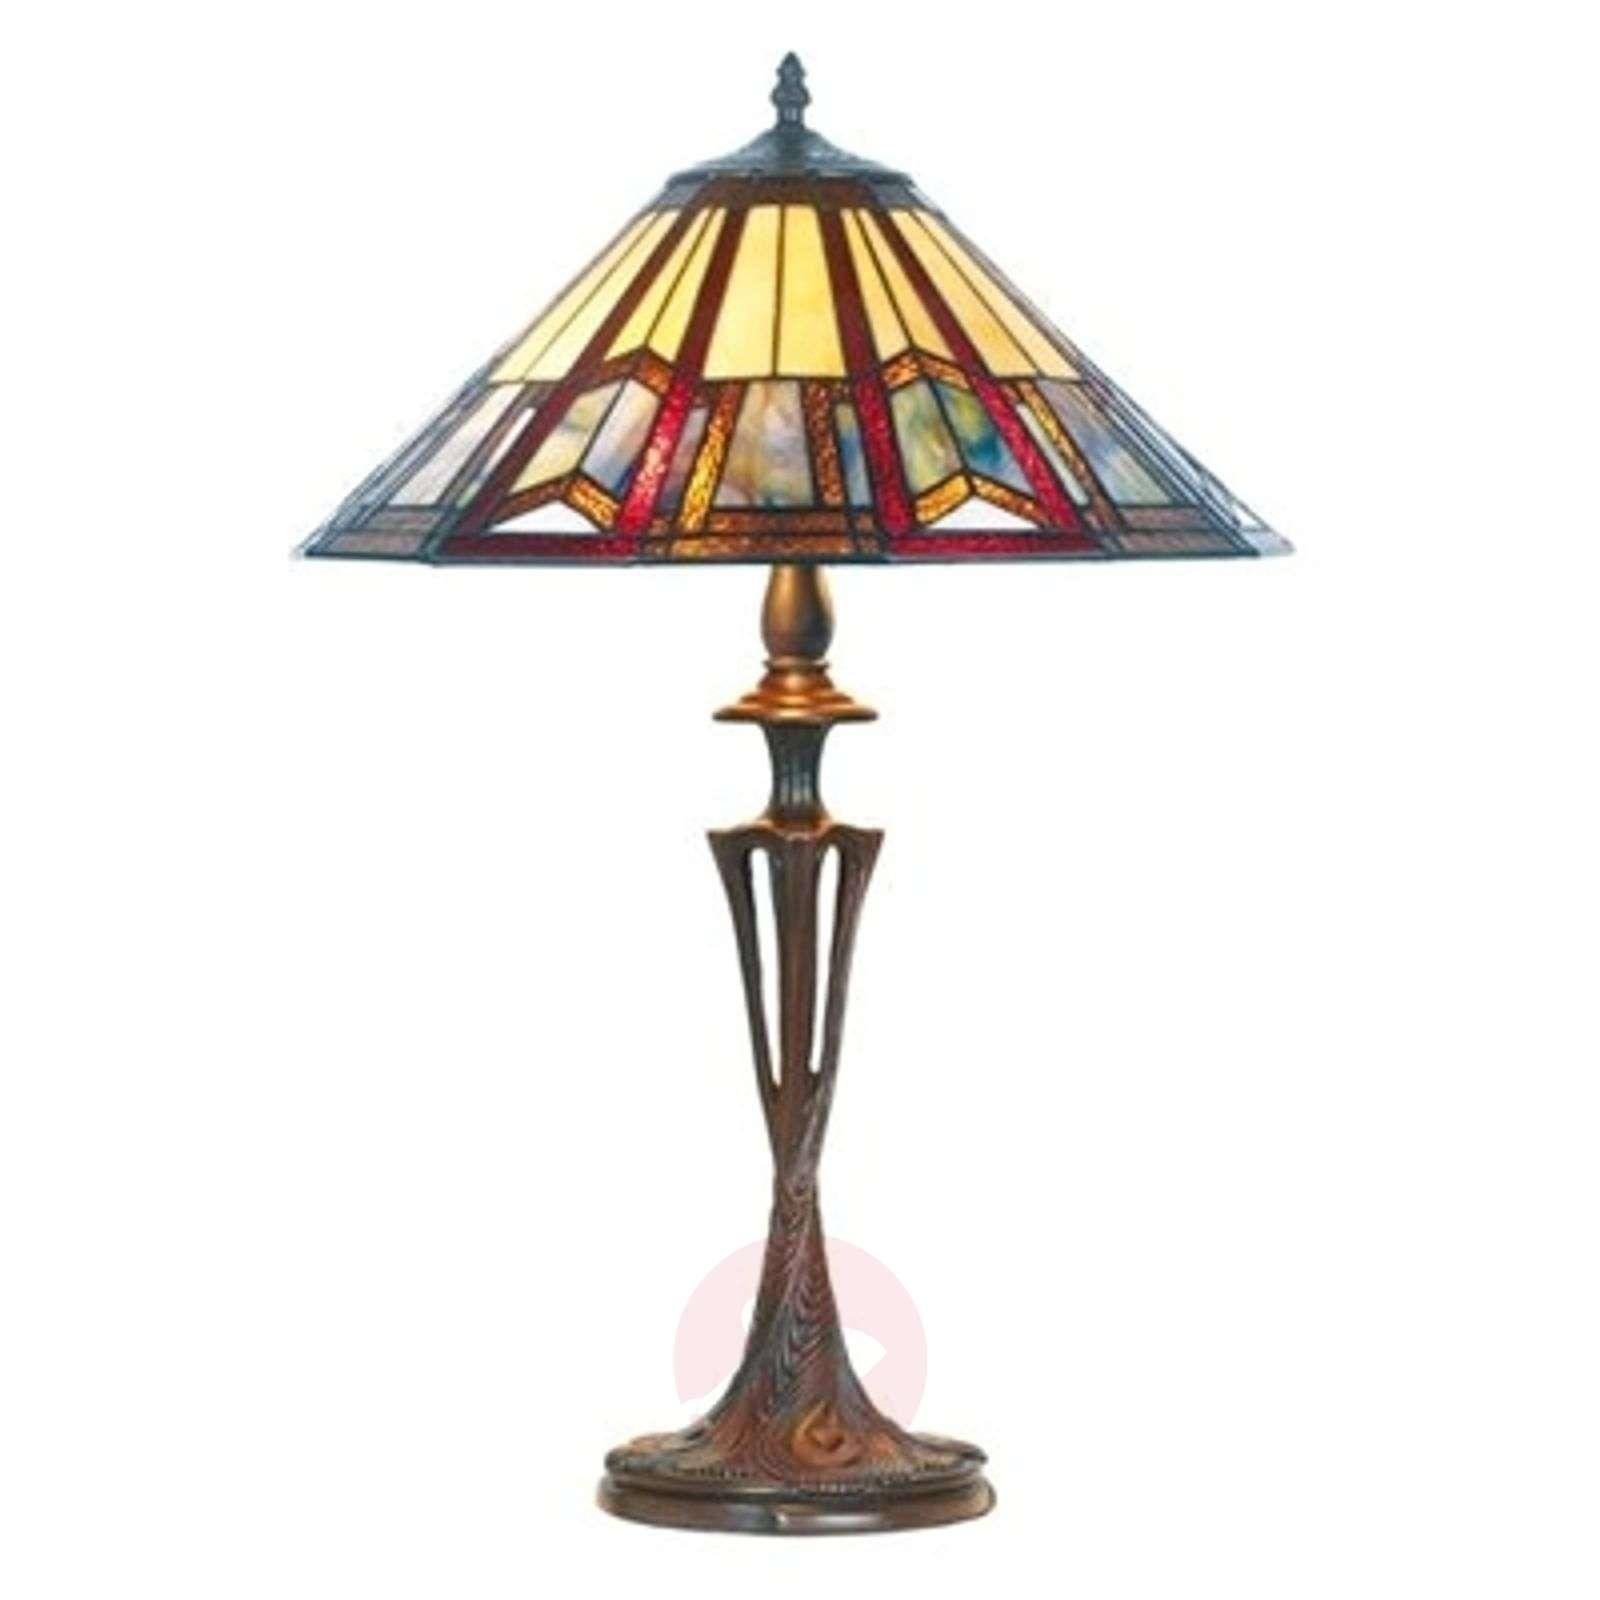 LILLIE elegant Tiffany-style table lamp-1032185-01